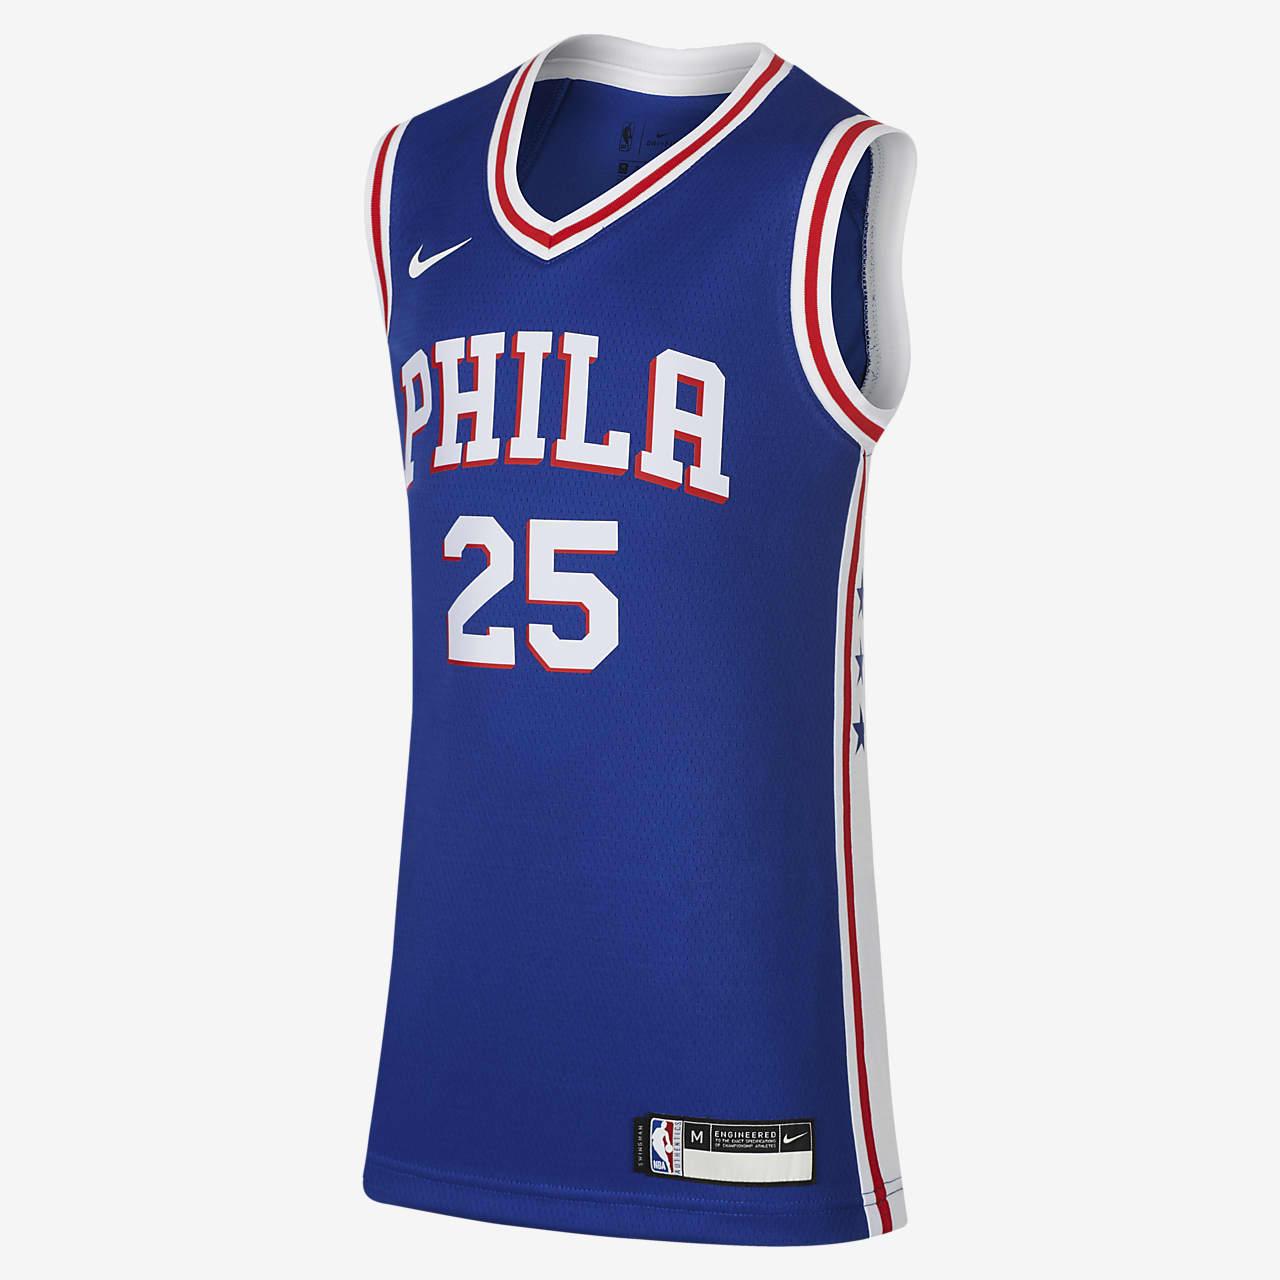 Camisola NBA da Nike Icon Edition Swingman Jersey (Philadelphia 76ers) Júnior